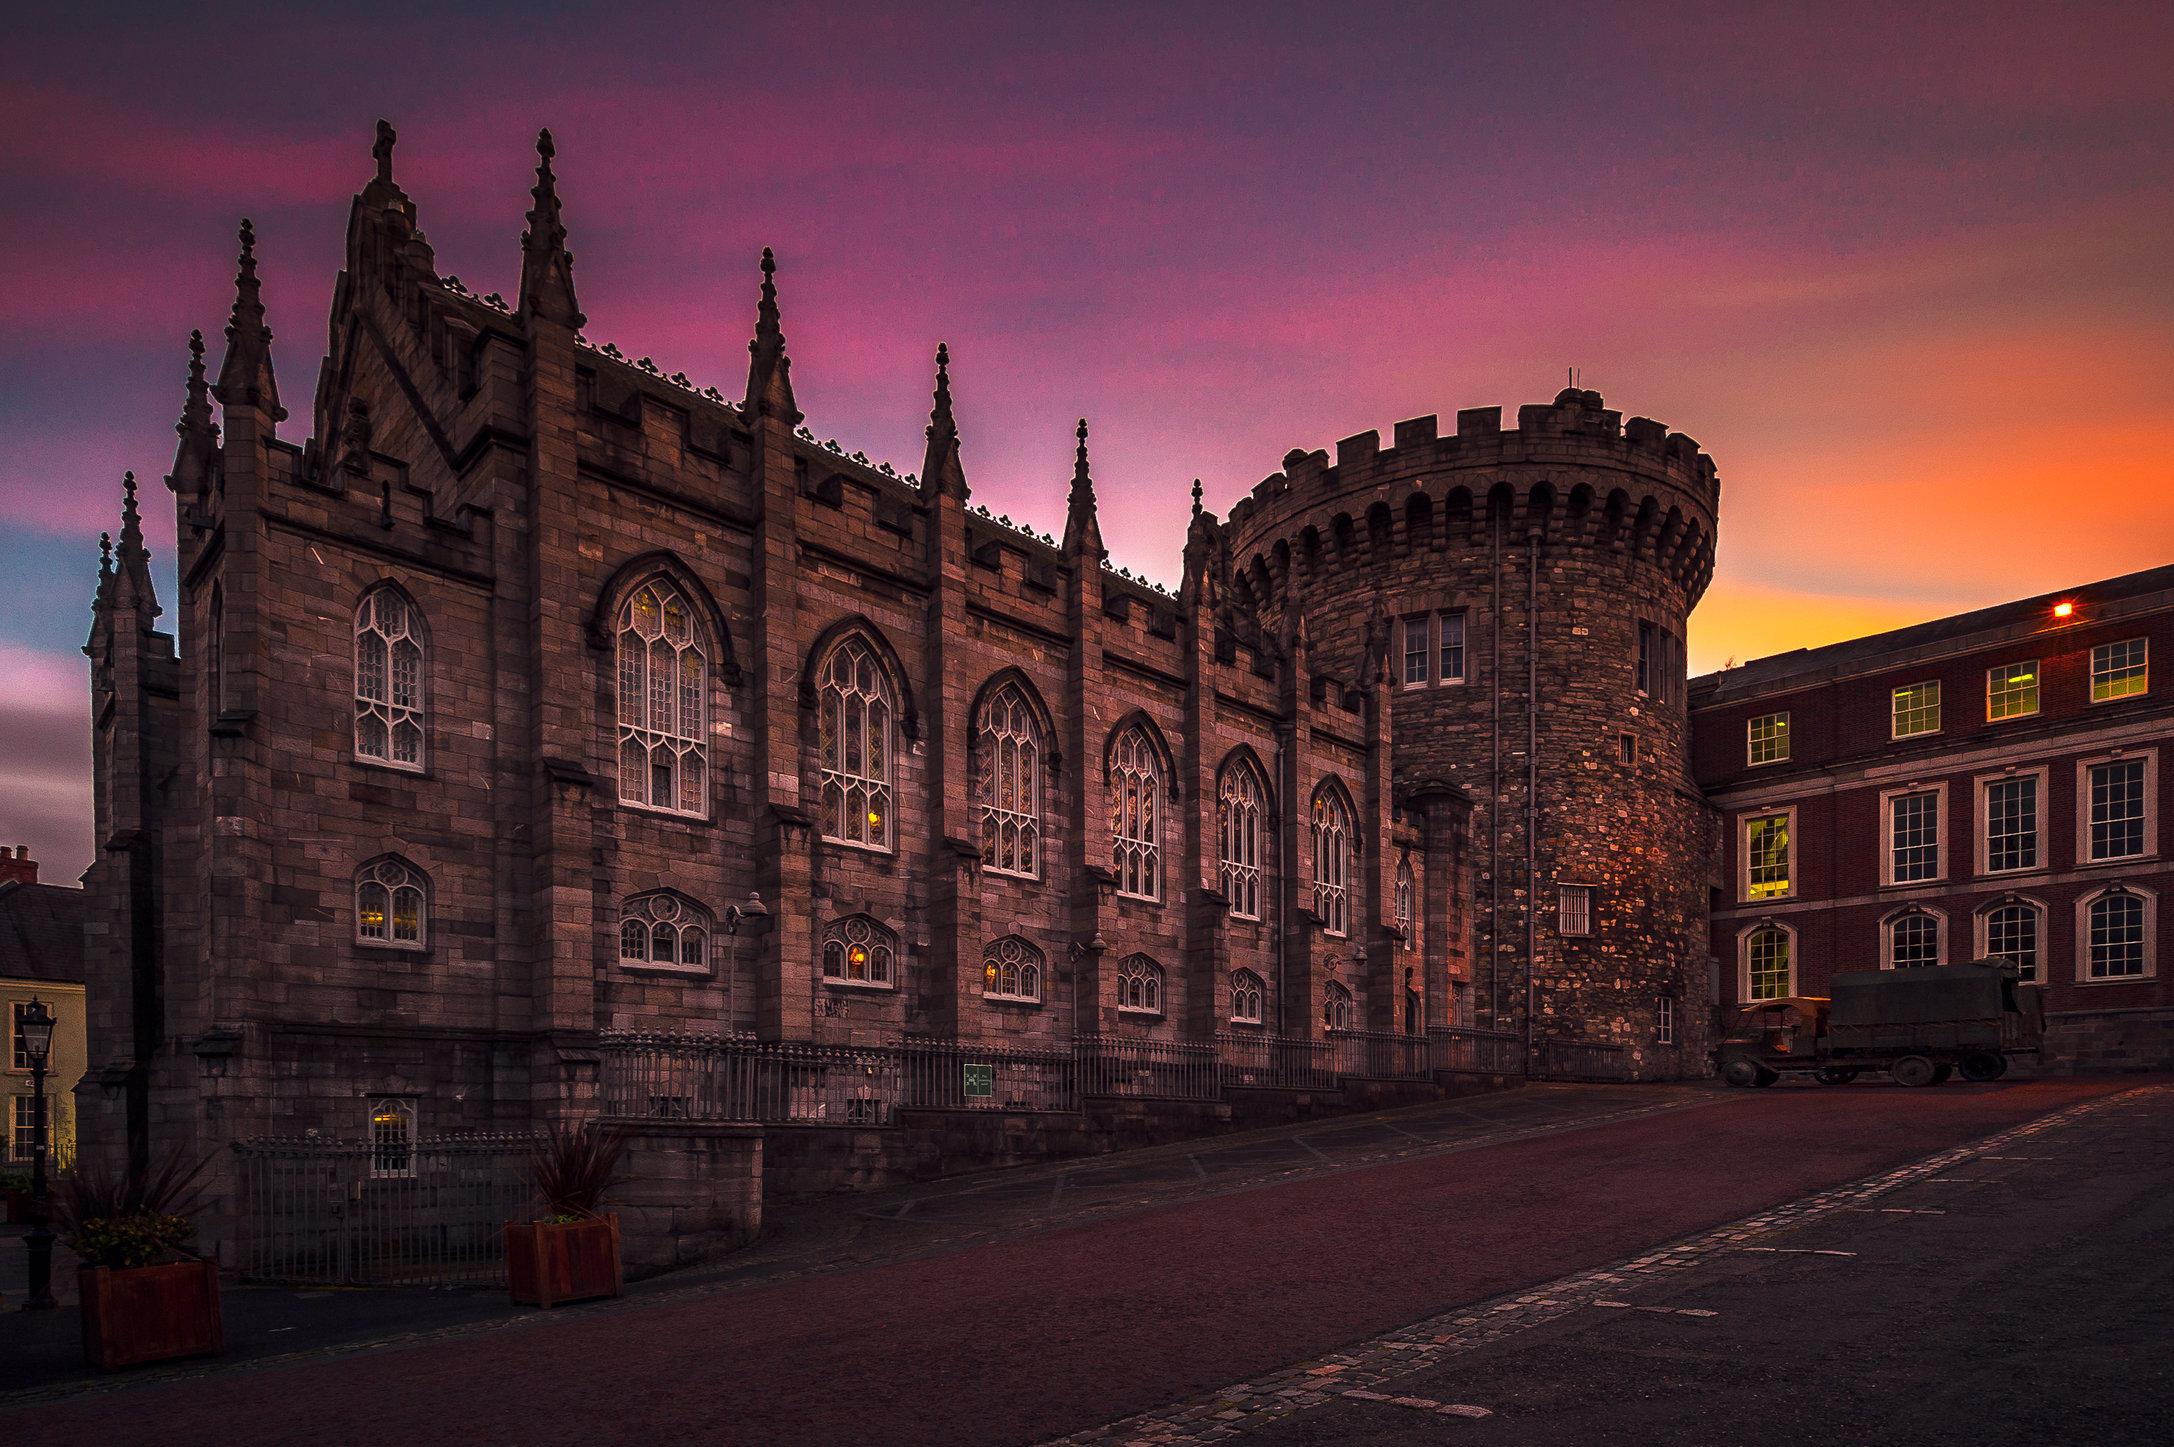 Dublin Castle-MASTER COPY.jpg